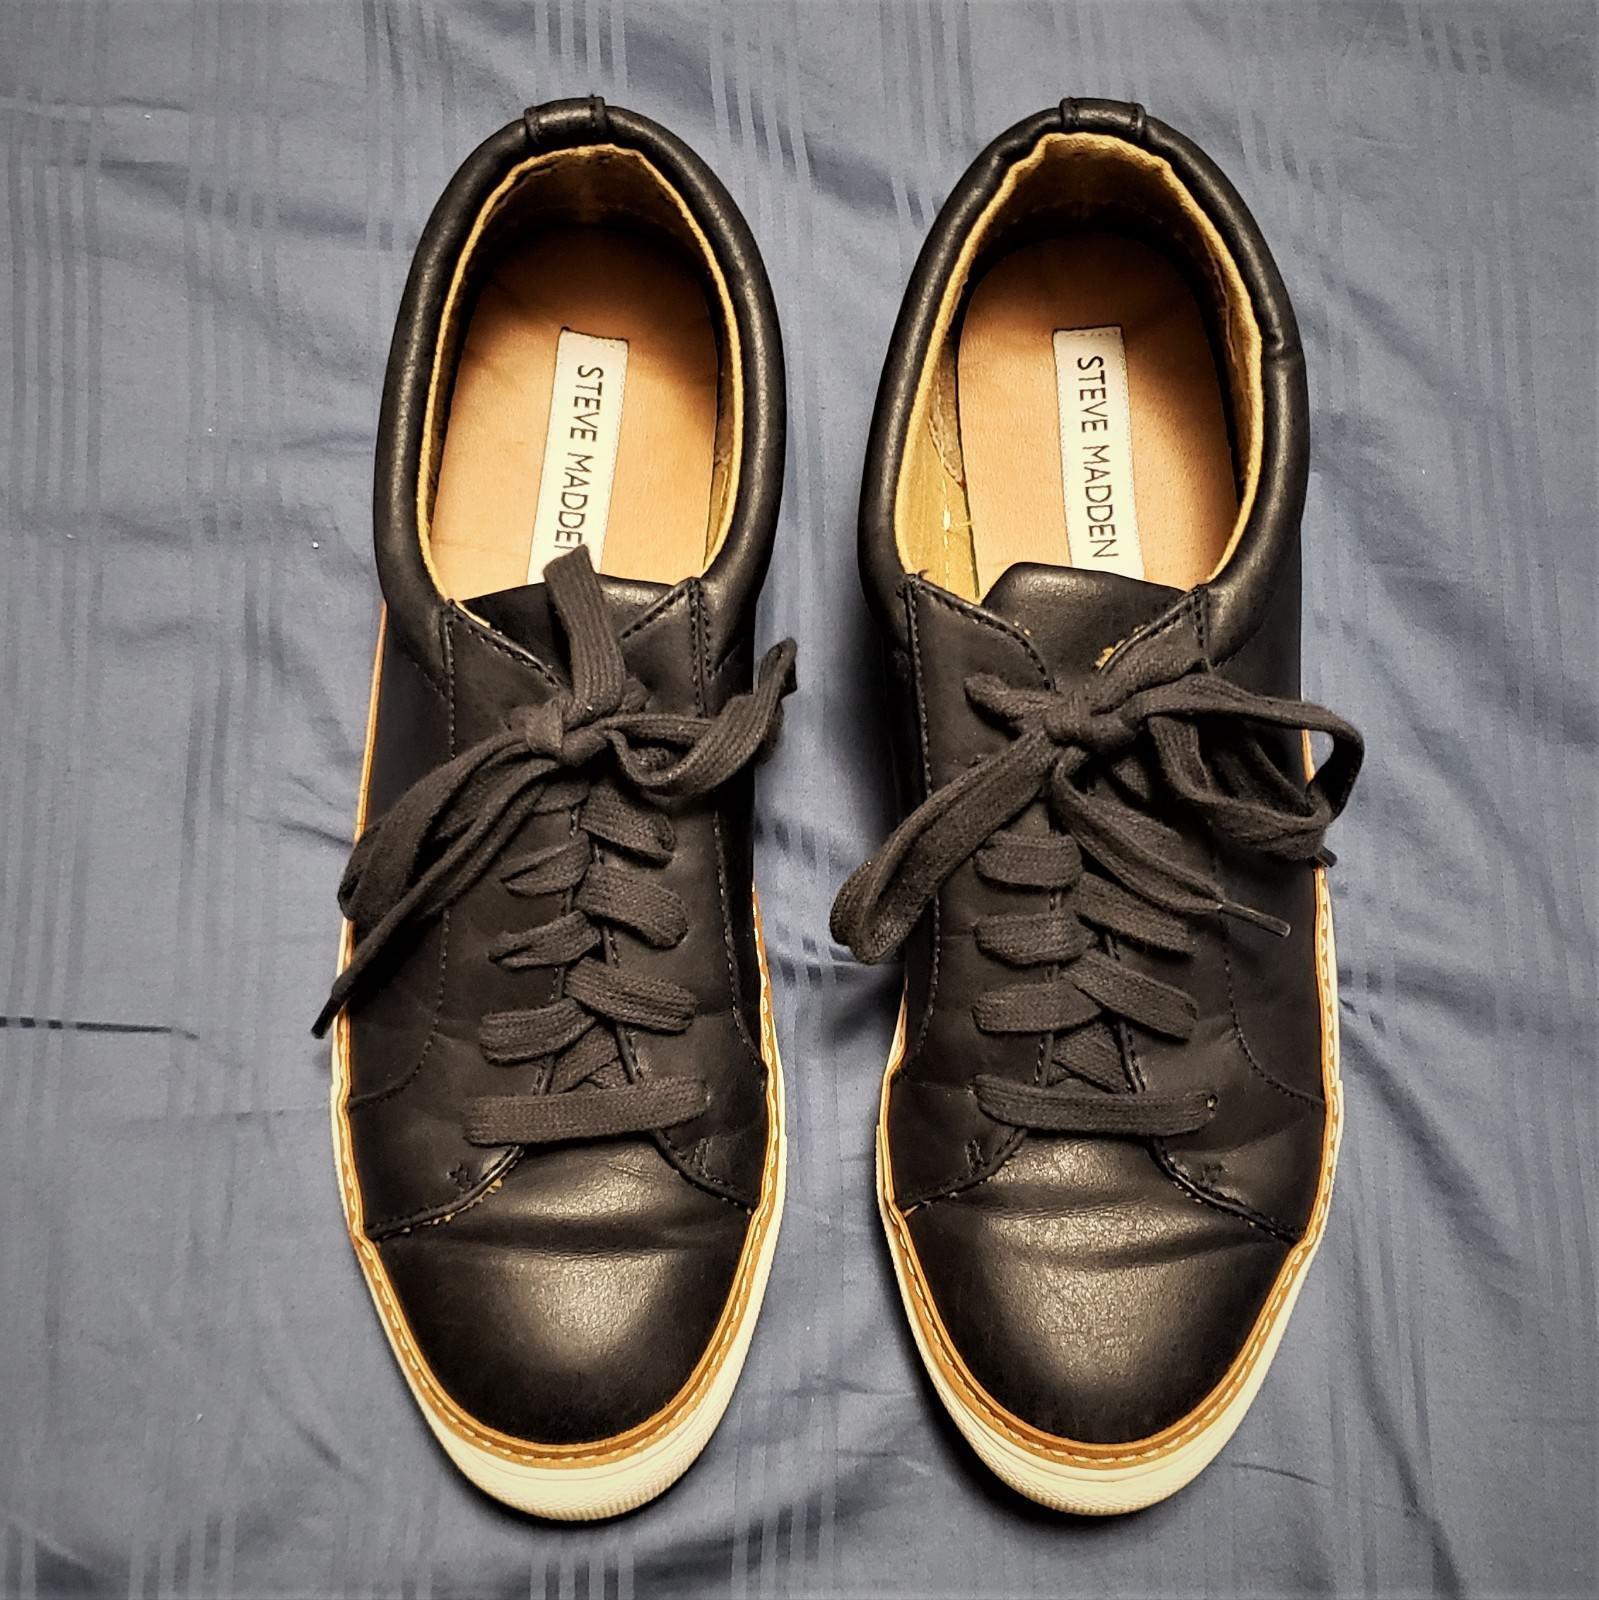 MEN'S STEVE MADDEN Size 7 Charcoal Blue Bonded Shoes Shoes Shoes w/ Brown Mid-Sole Trim 0051ff